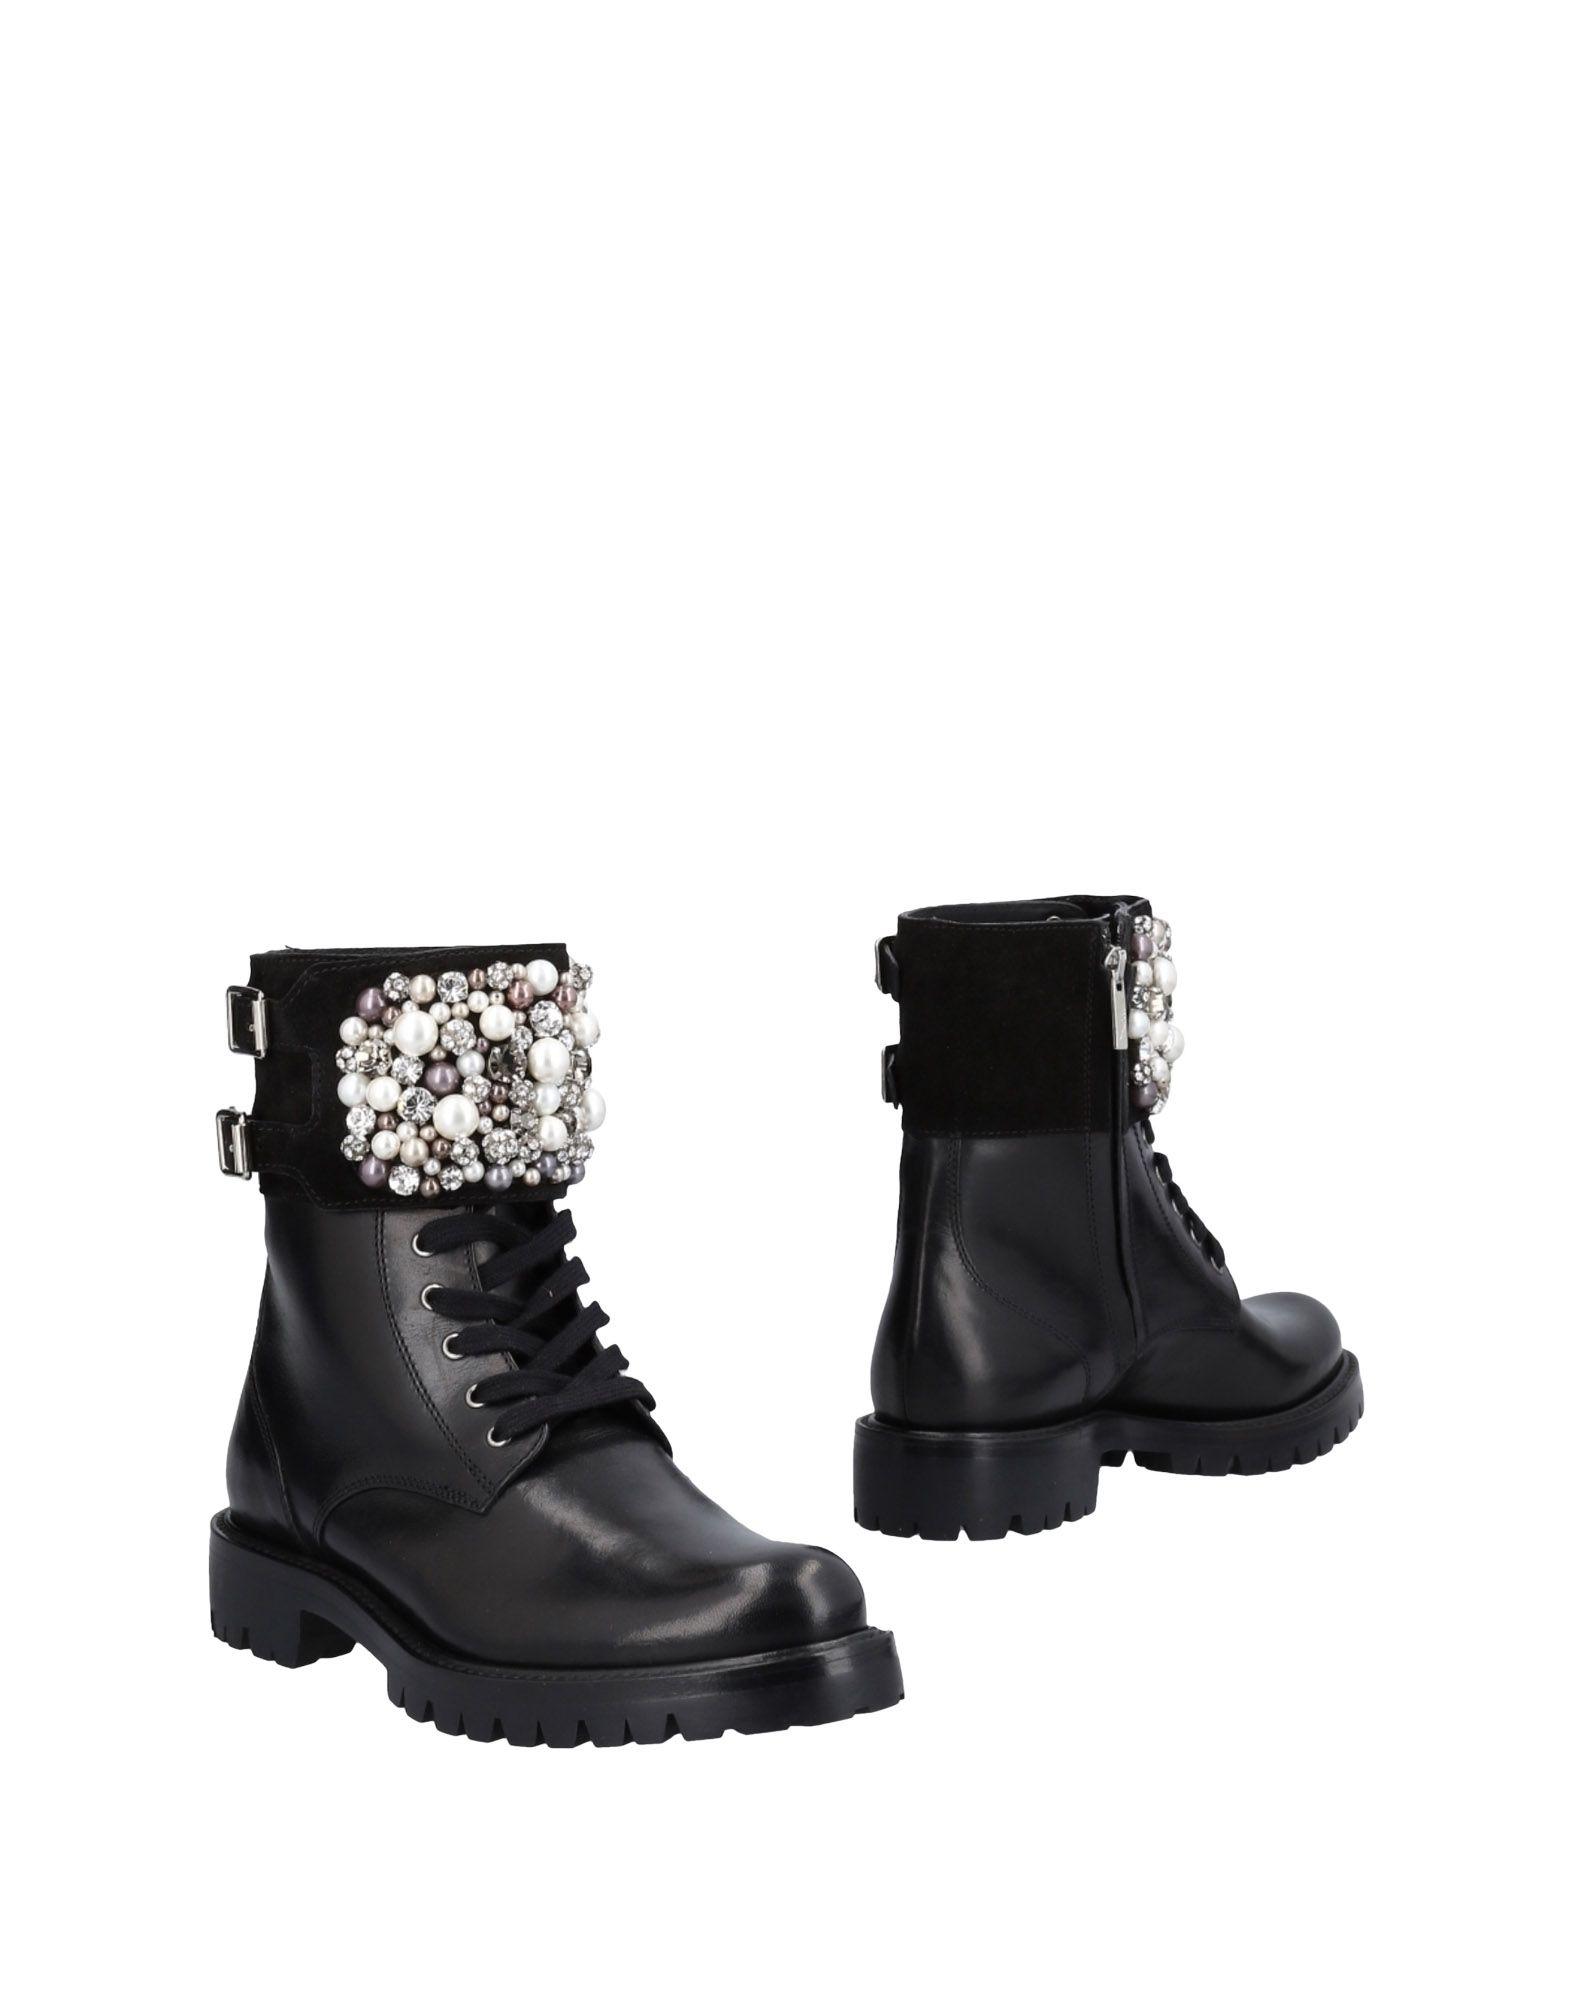 Rene' Caovilla Stiefelette Damen Schuhe  11489265PVGünstige gut aussehende Schuhe Damen df0ac7